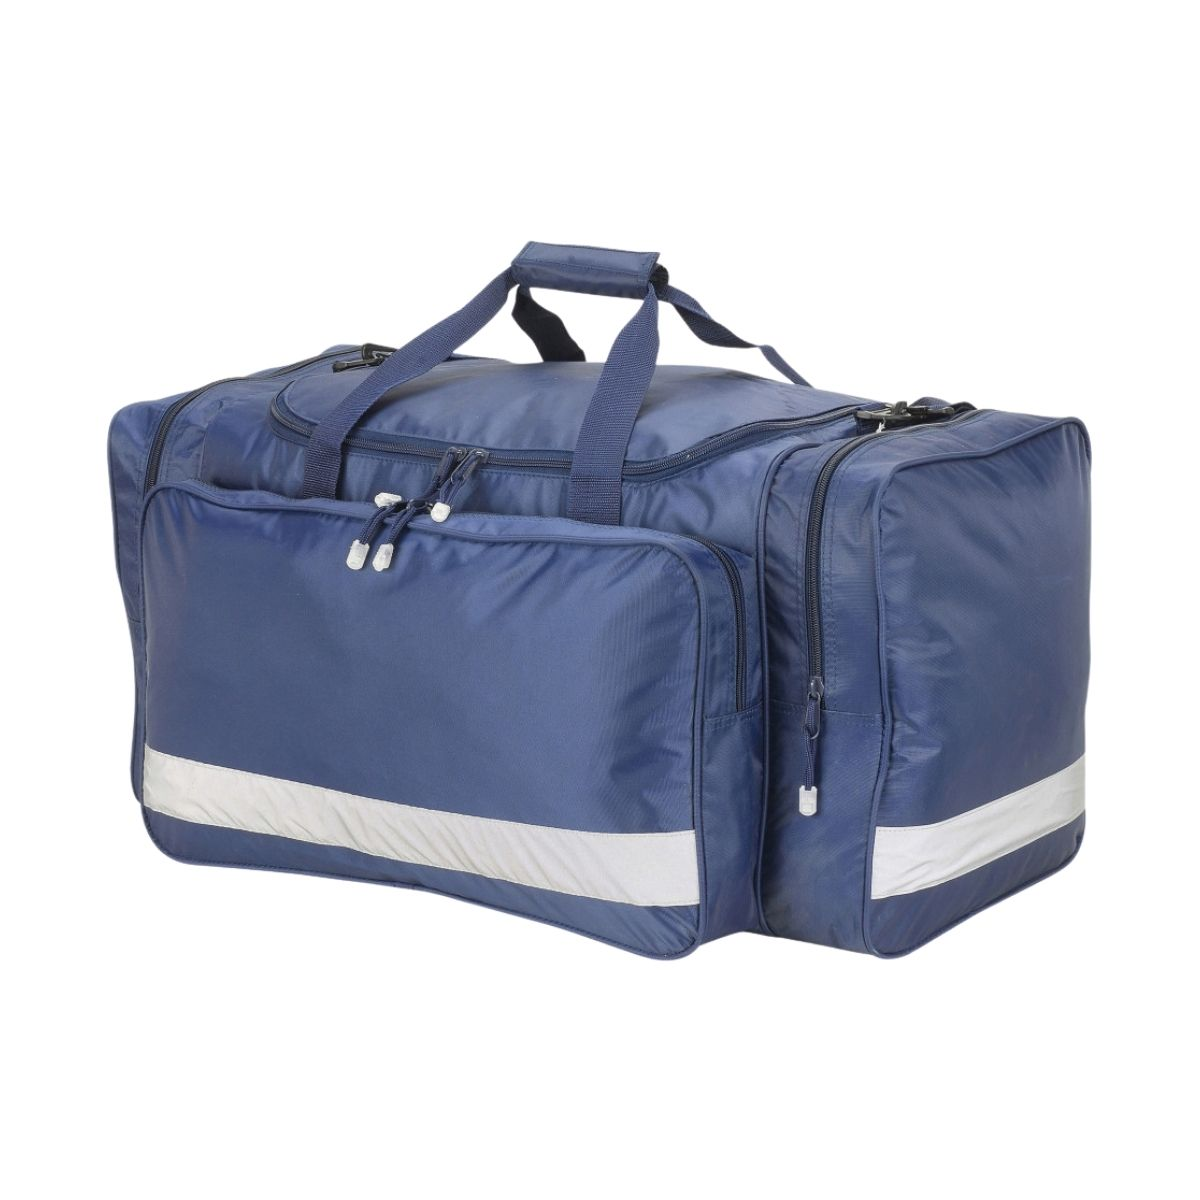 DK1879 Glasgow Jumbo Navy Kit Bag 75L (Large)